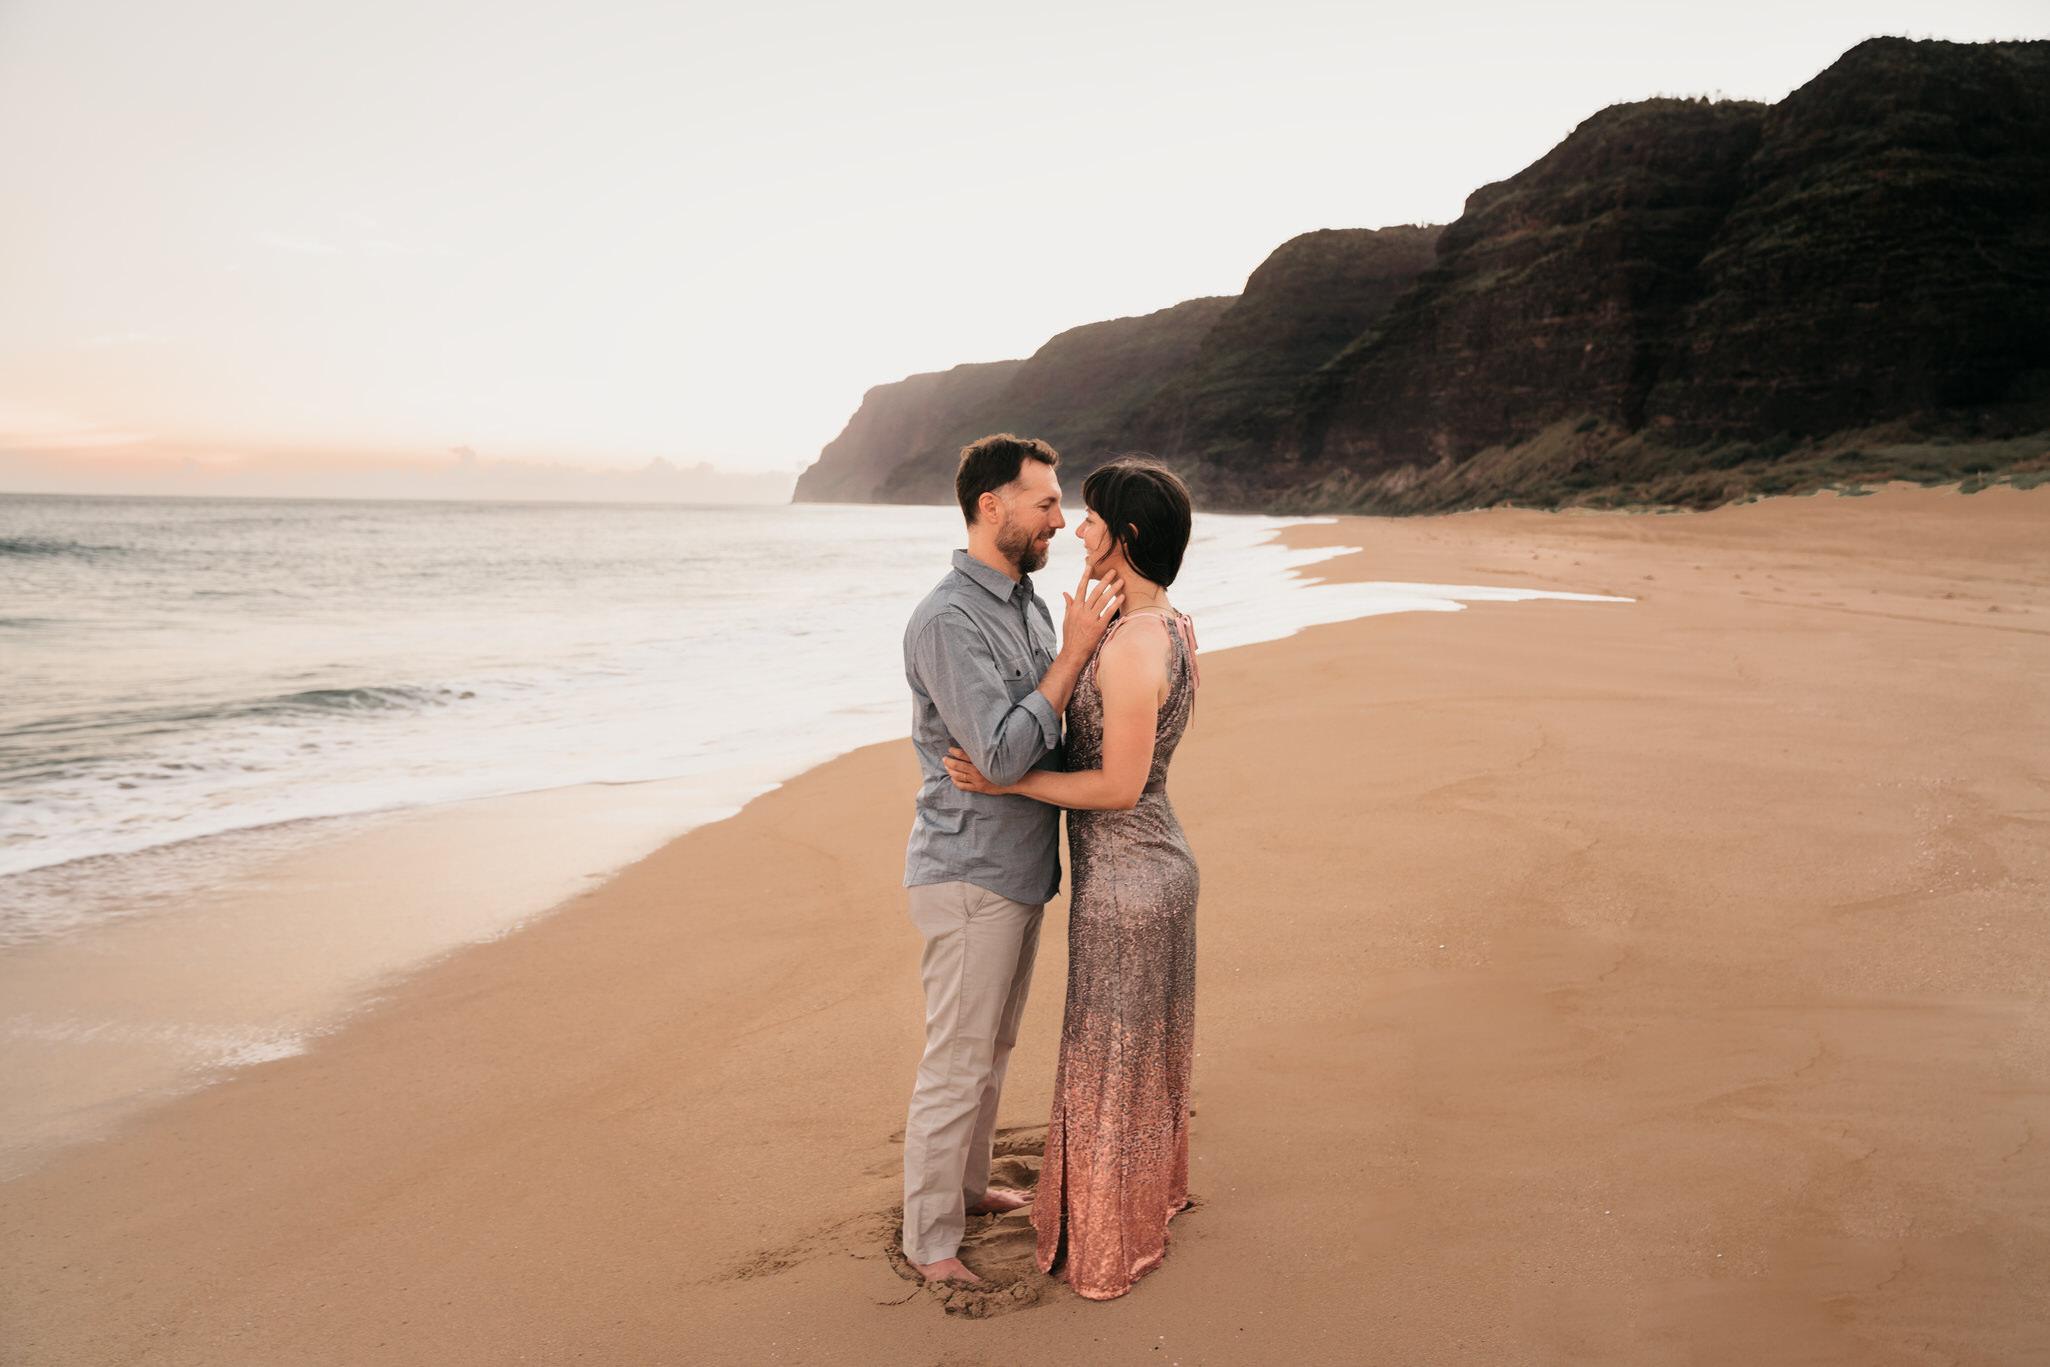 ADVENTURE ELOPEMENT PHOTOGRAPHER | KAUAI ELOPEMENT